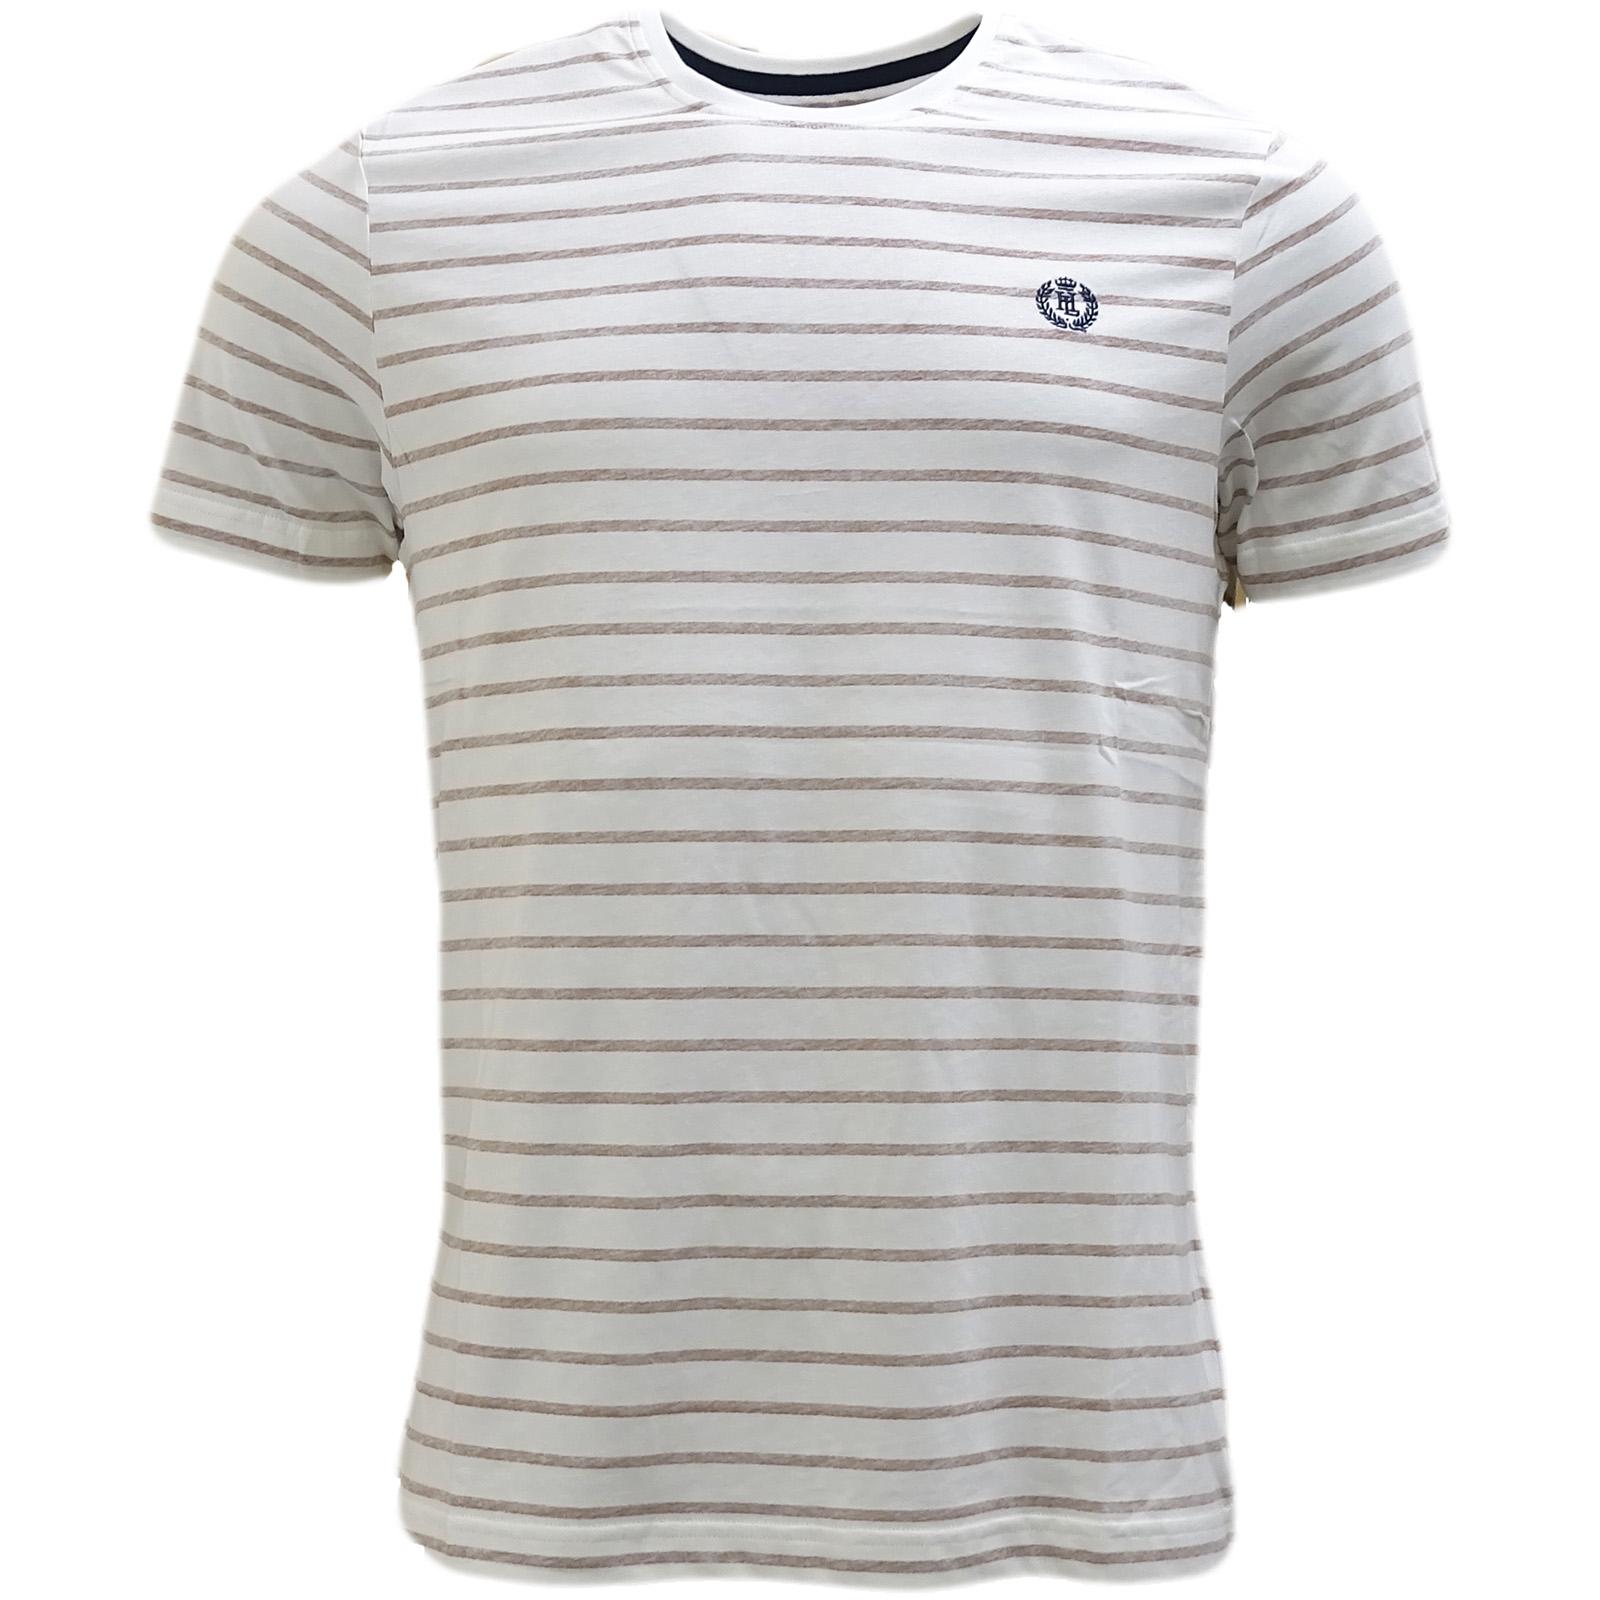 Henri Lloyd Ecru - Wrs Stripe T-Shirt Bretton -